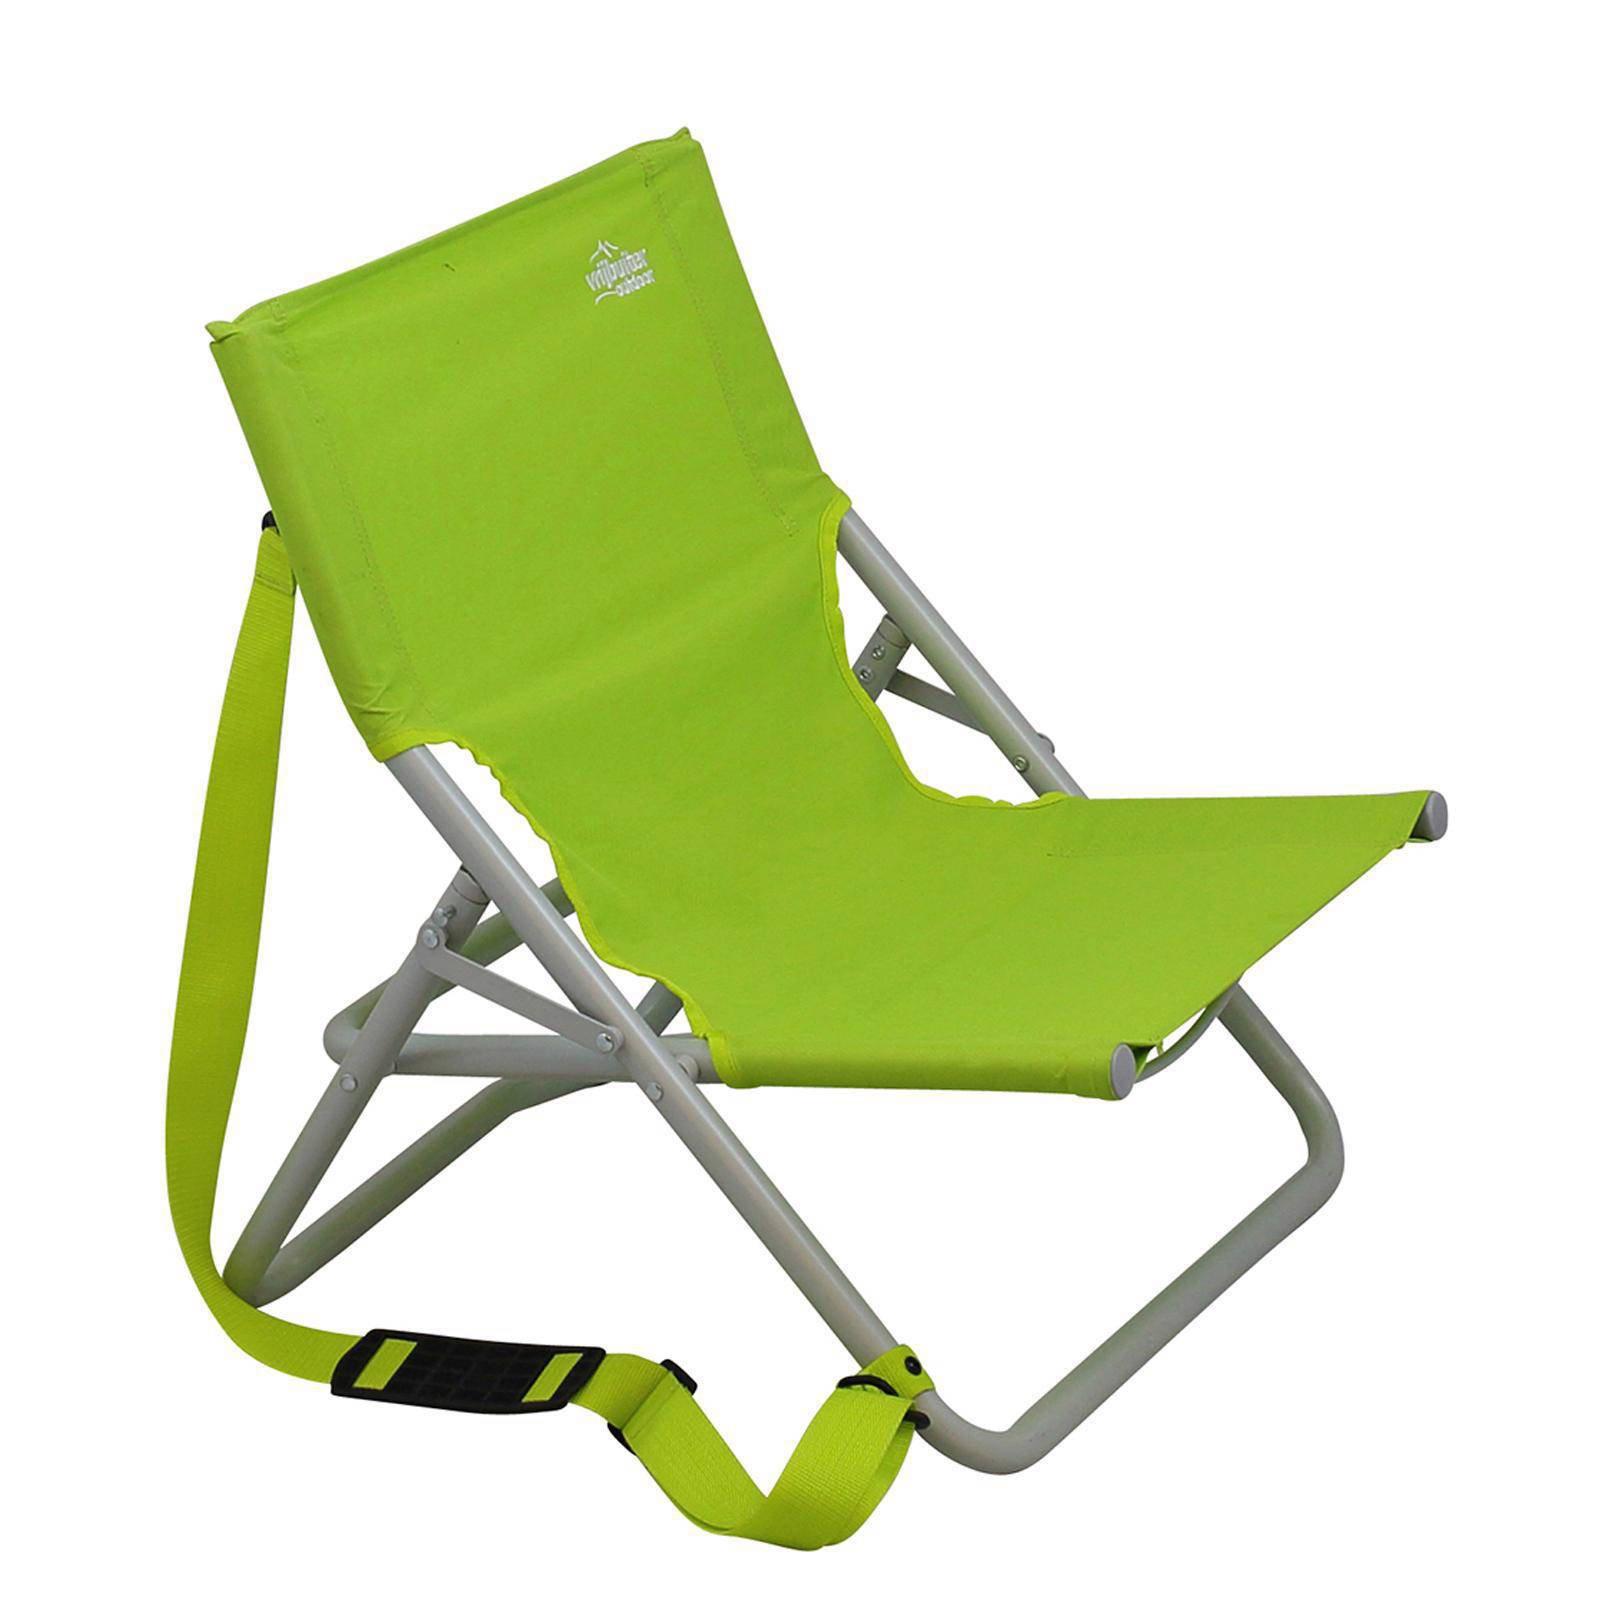 Lichtgewicht Opvouwbare Strandstoel.Cas Abao Lichtgewicht Camping Strandstoel